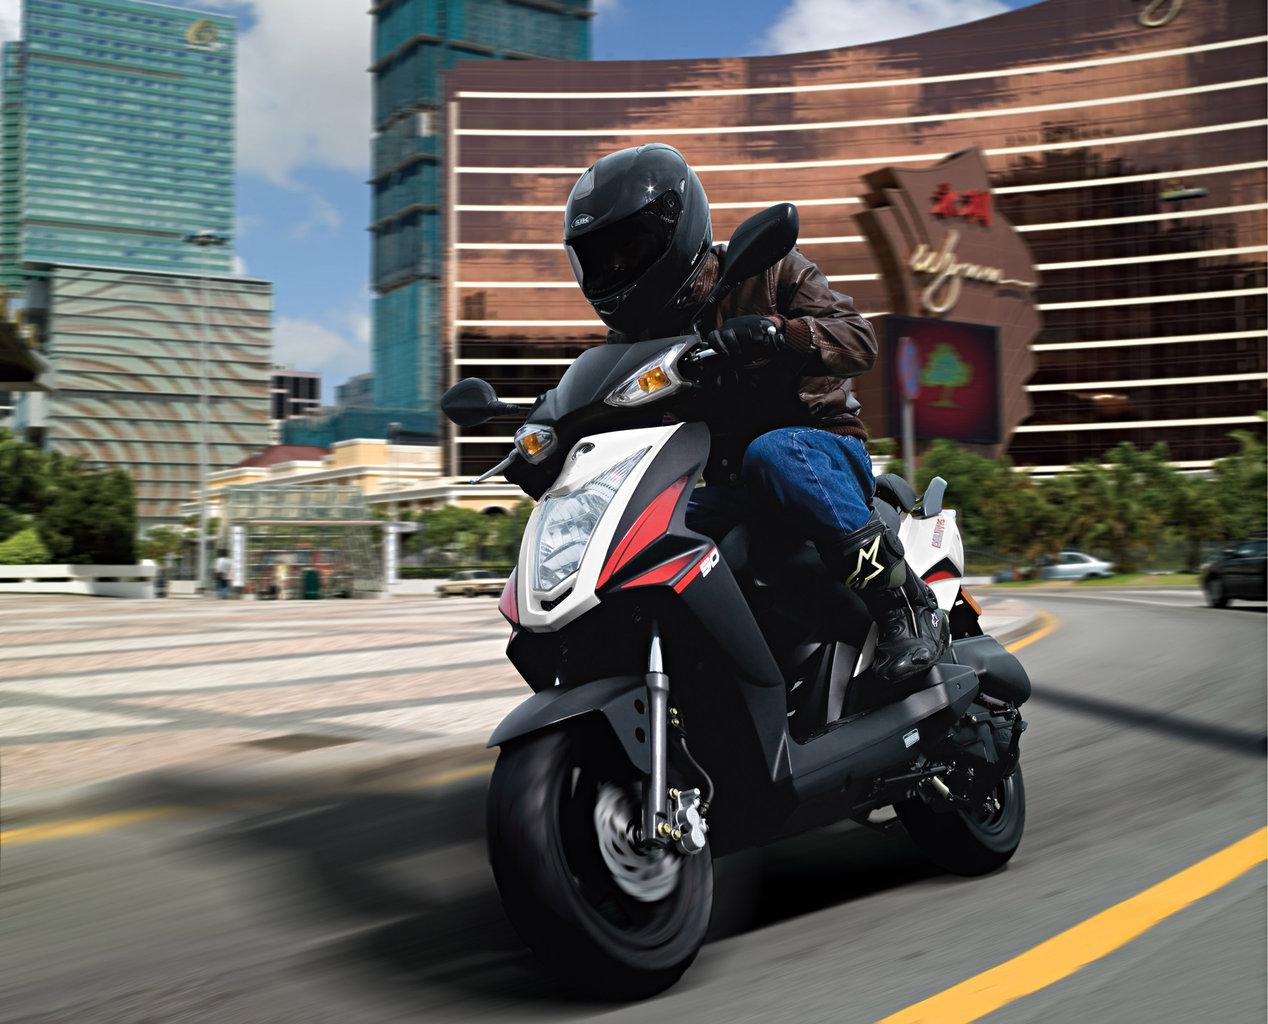 Listino Kymco Agility 125 Carry Scooter 125 - image 14836_kymco-agility125-rs on https://moto.motori.net